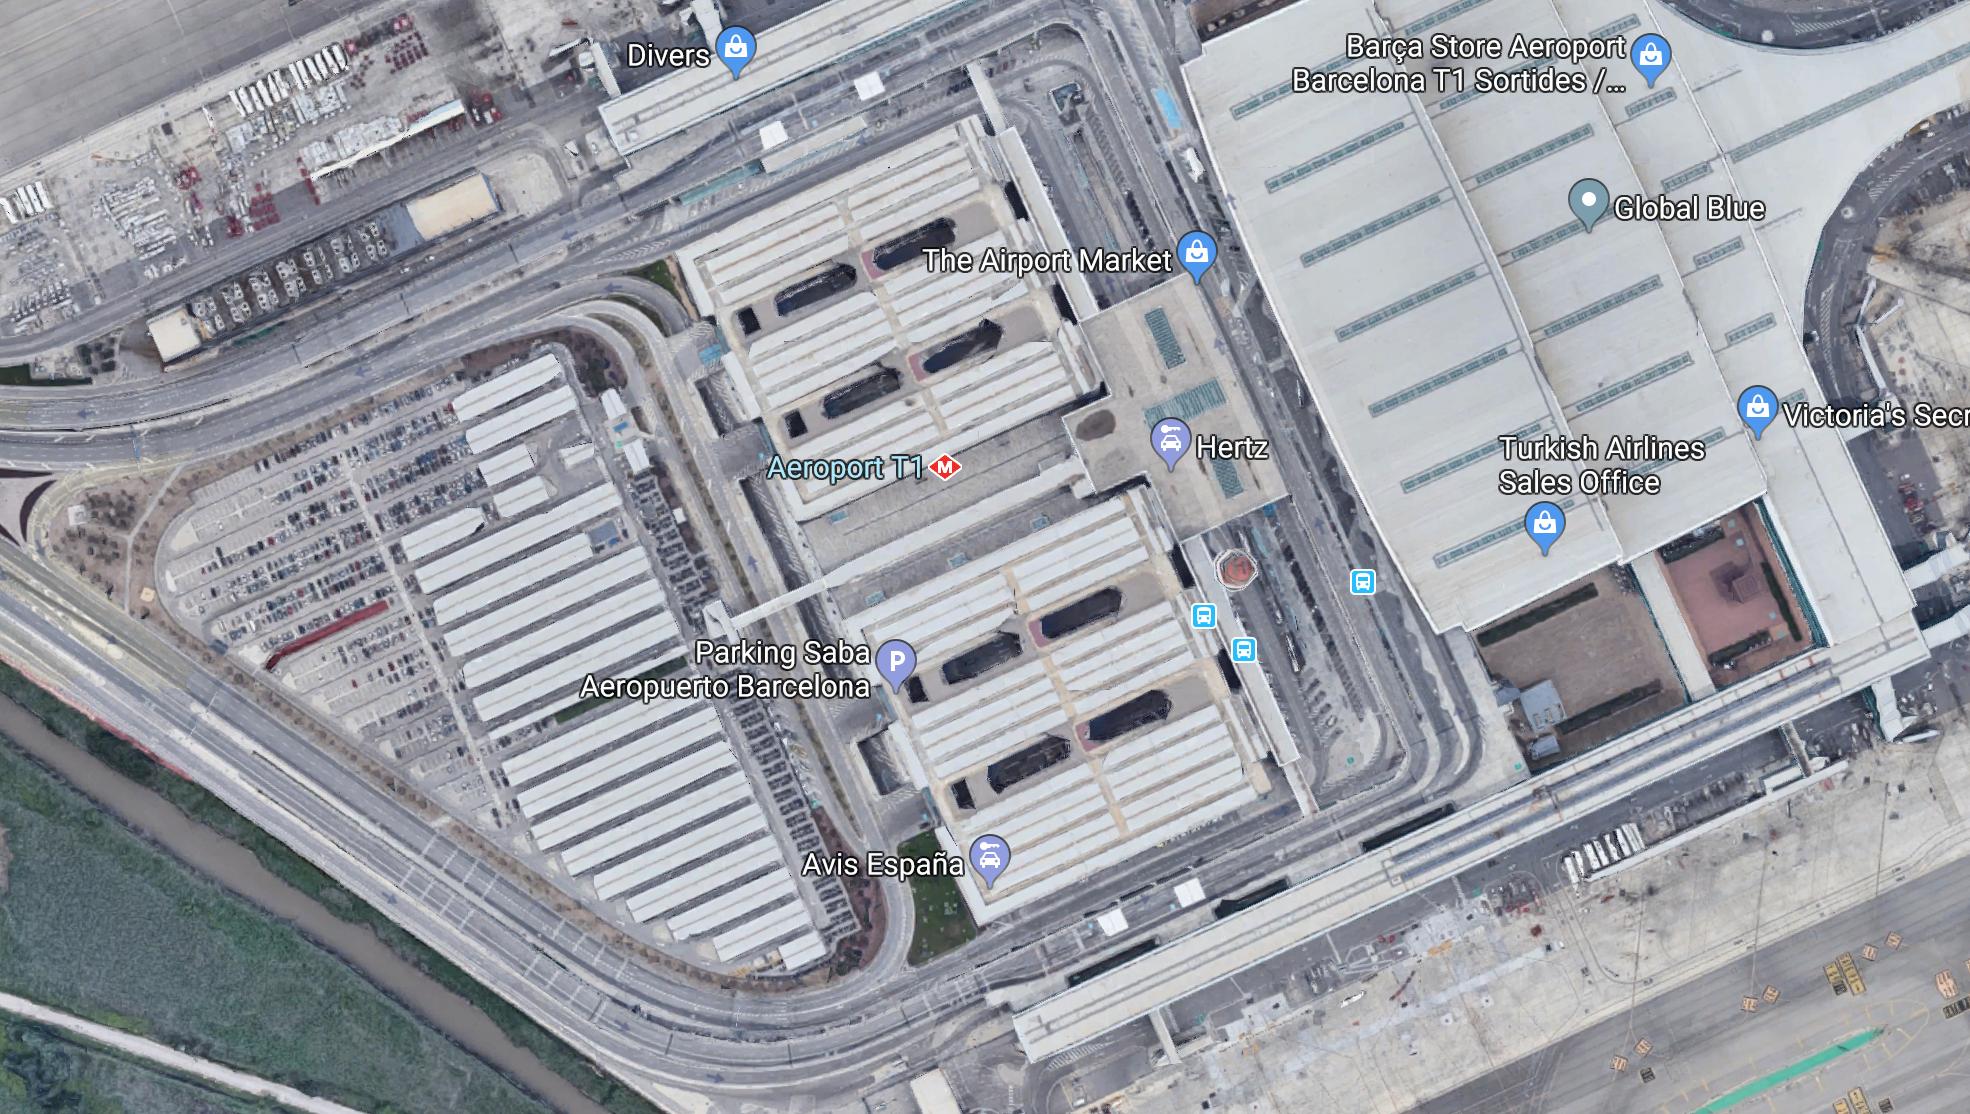 Aeropuerto BCN - Terminal 1